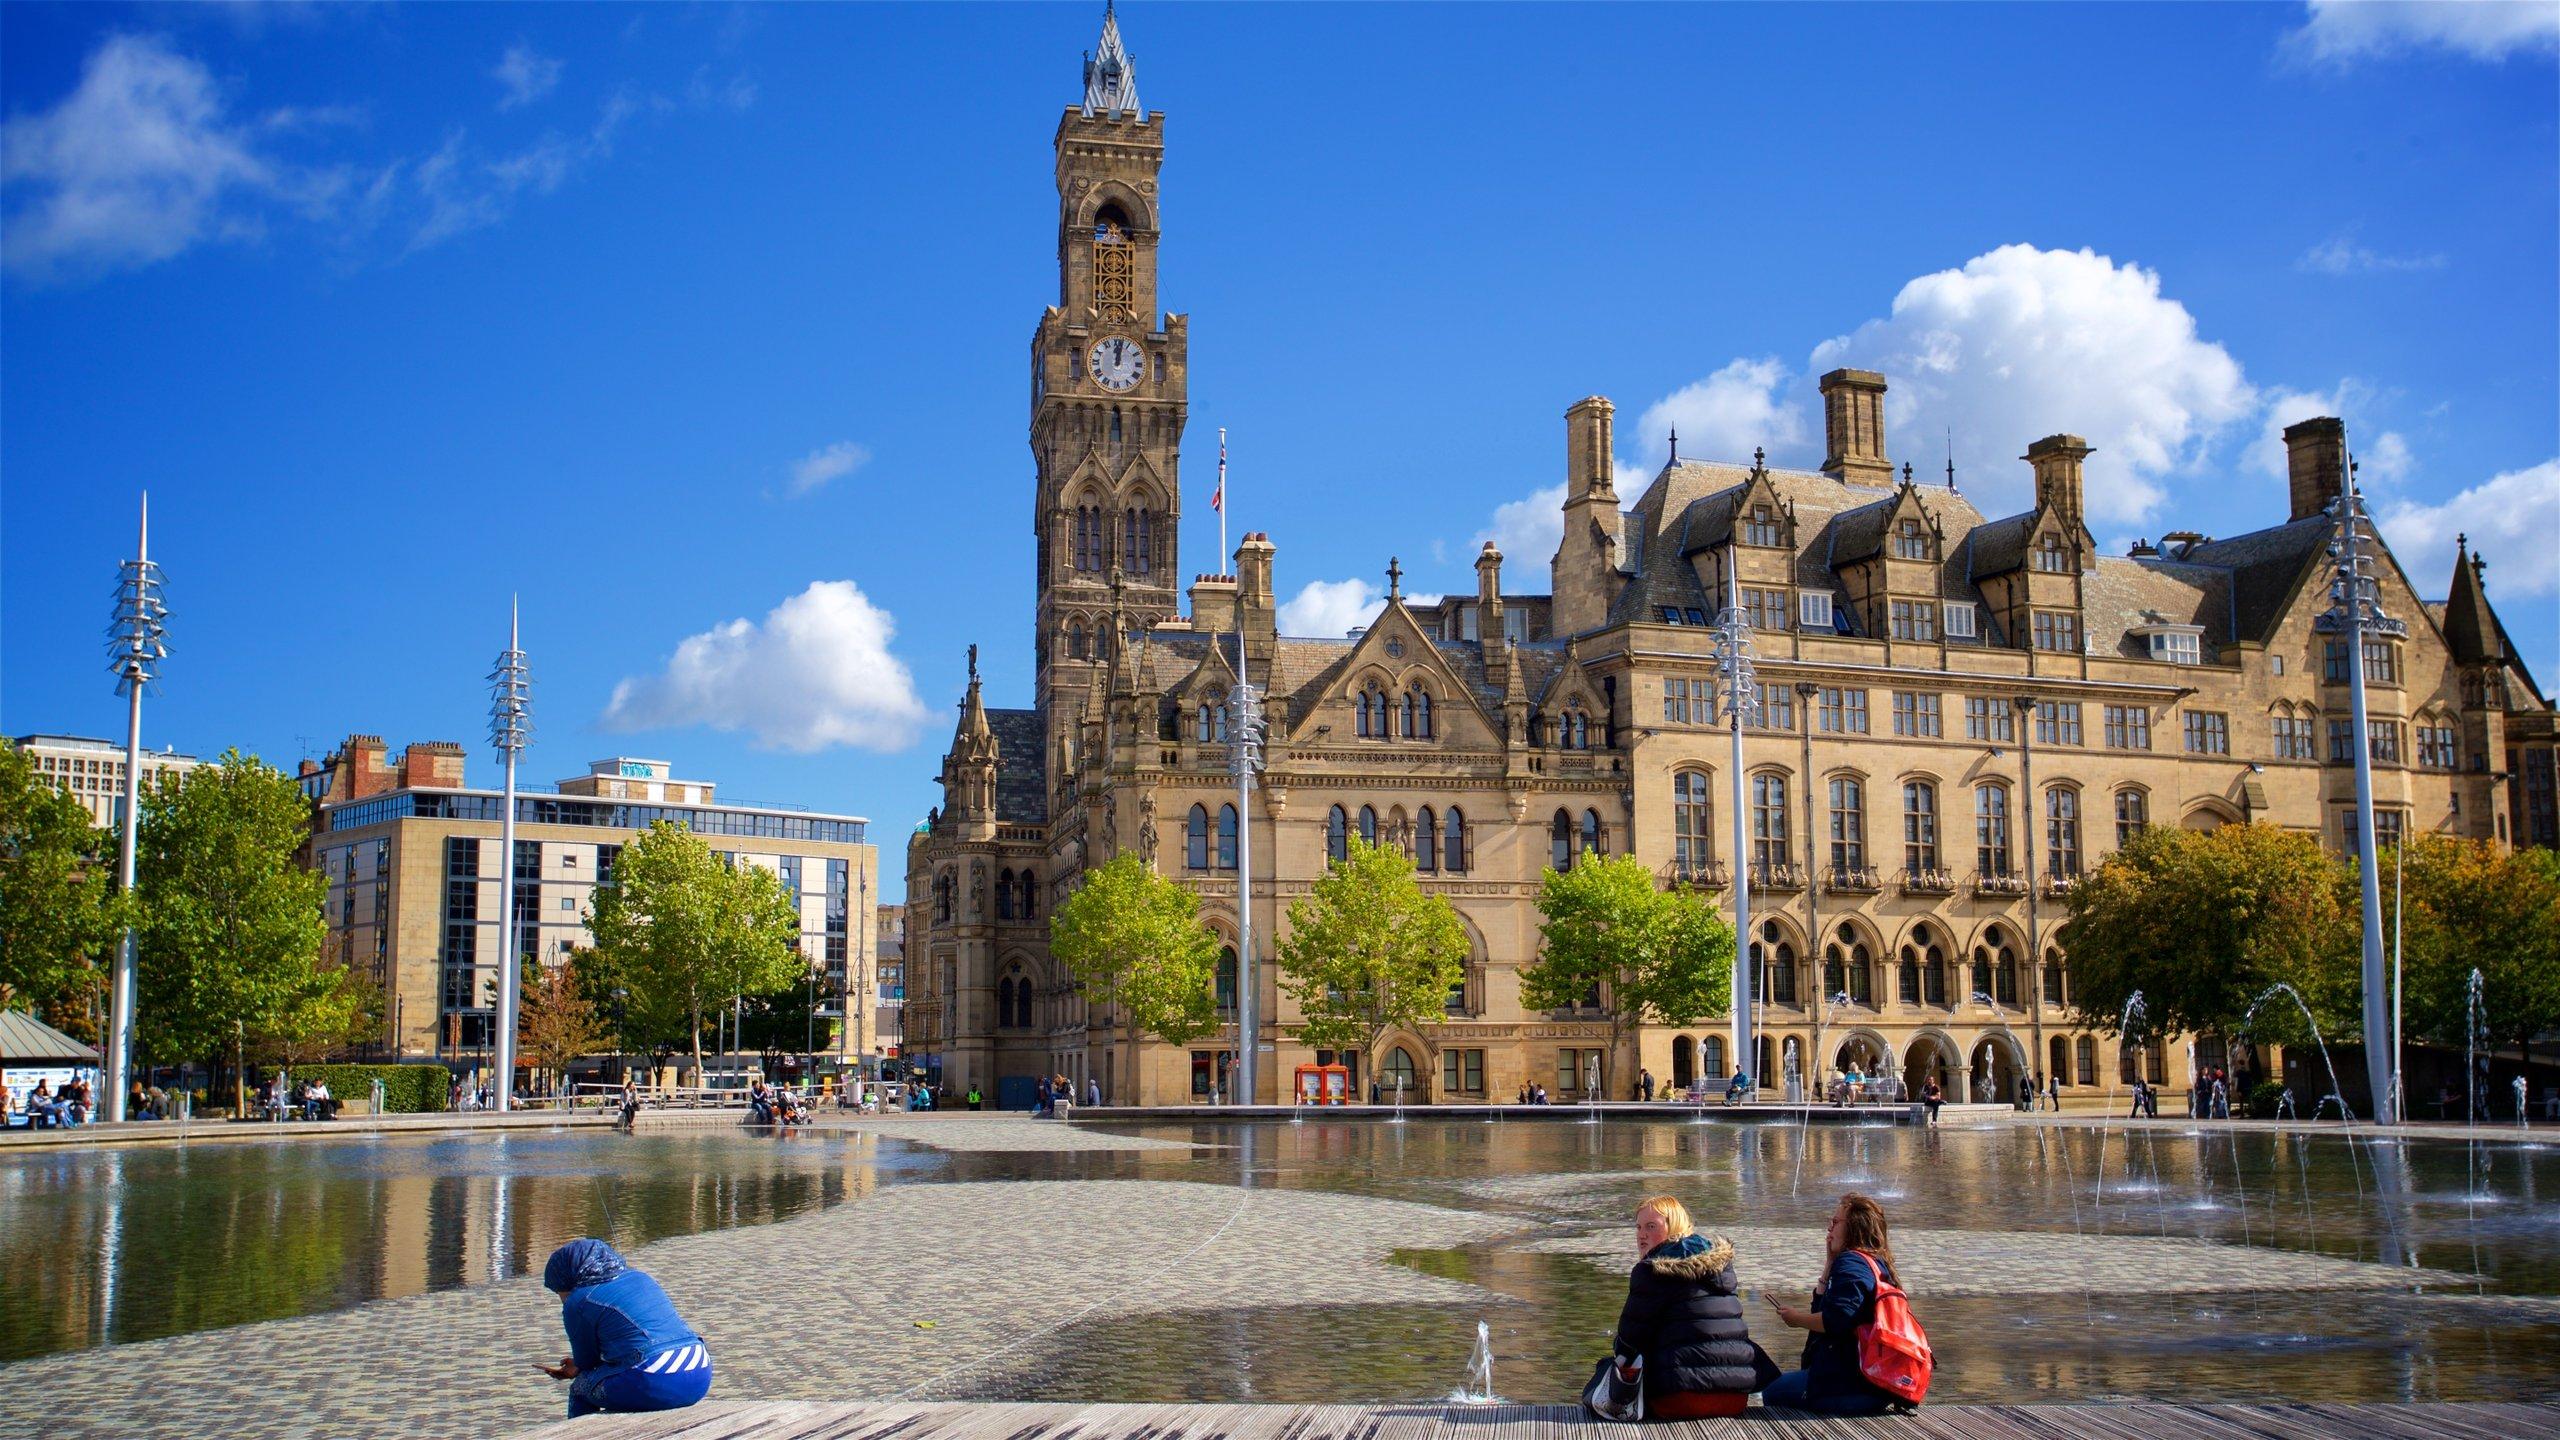 Bradford, England, United Kingdom